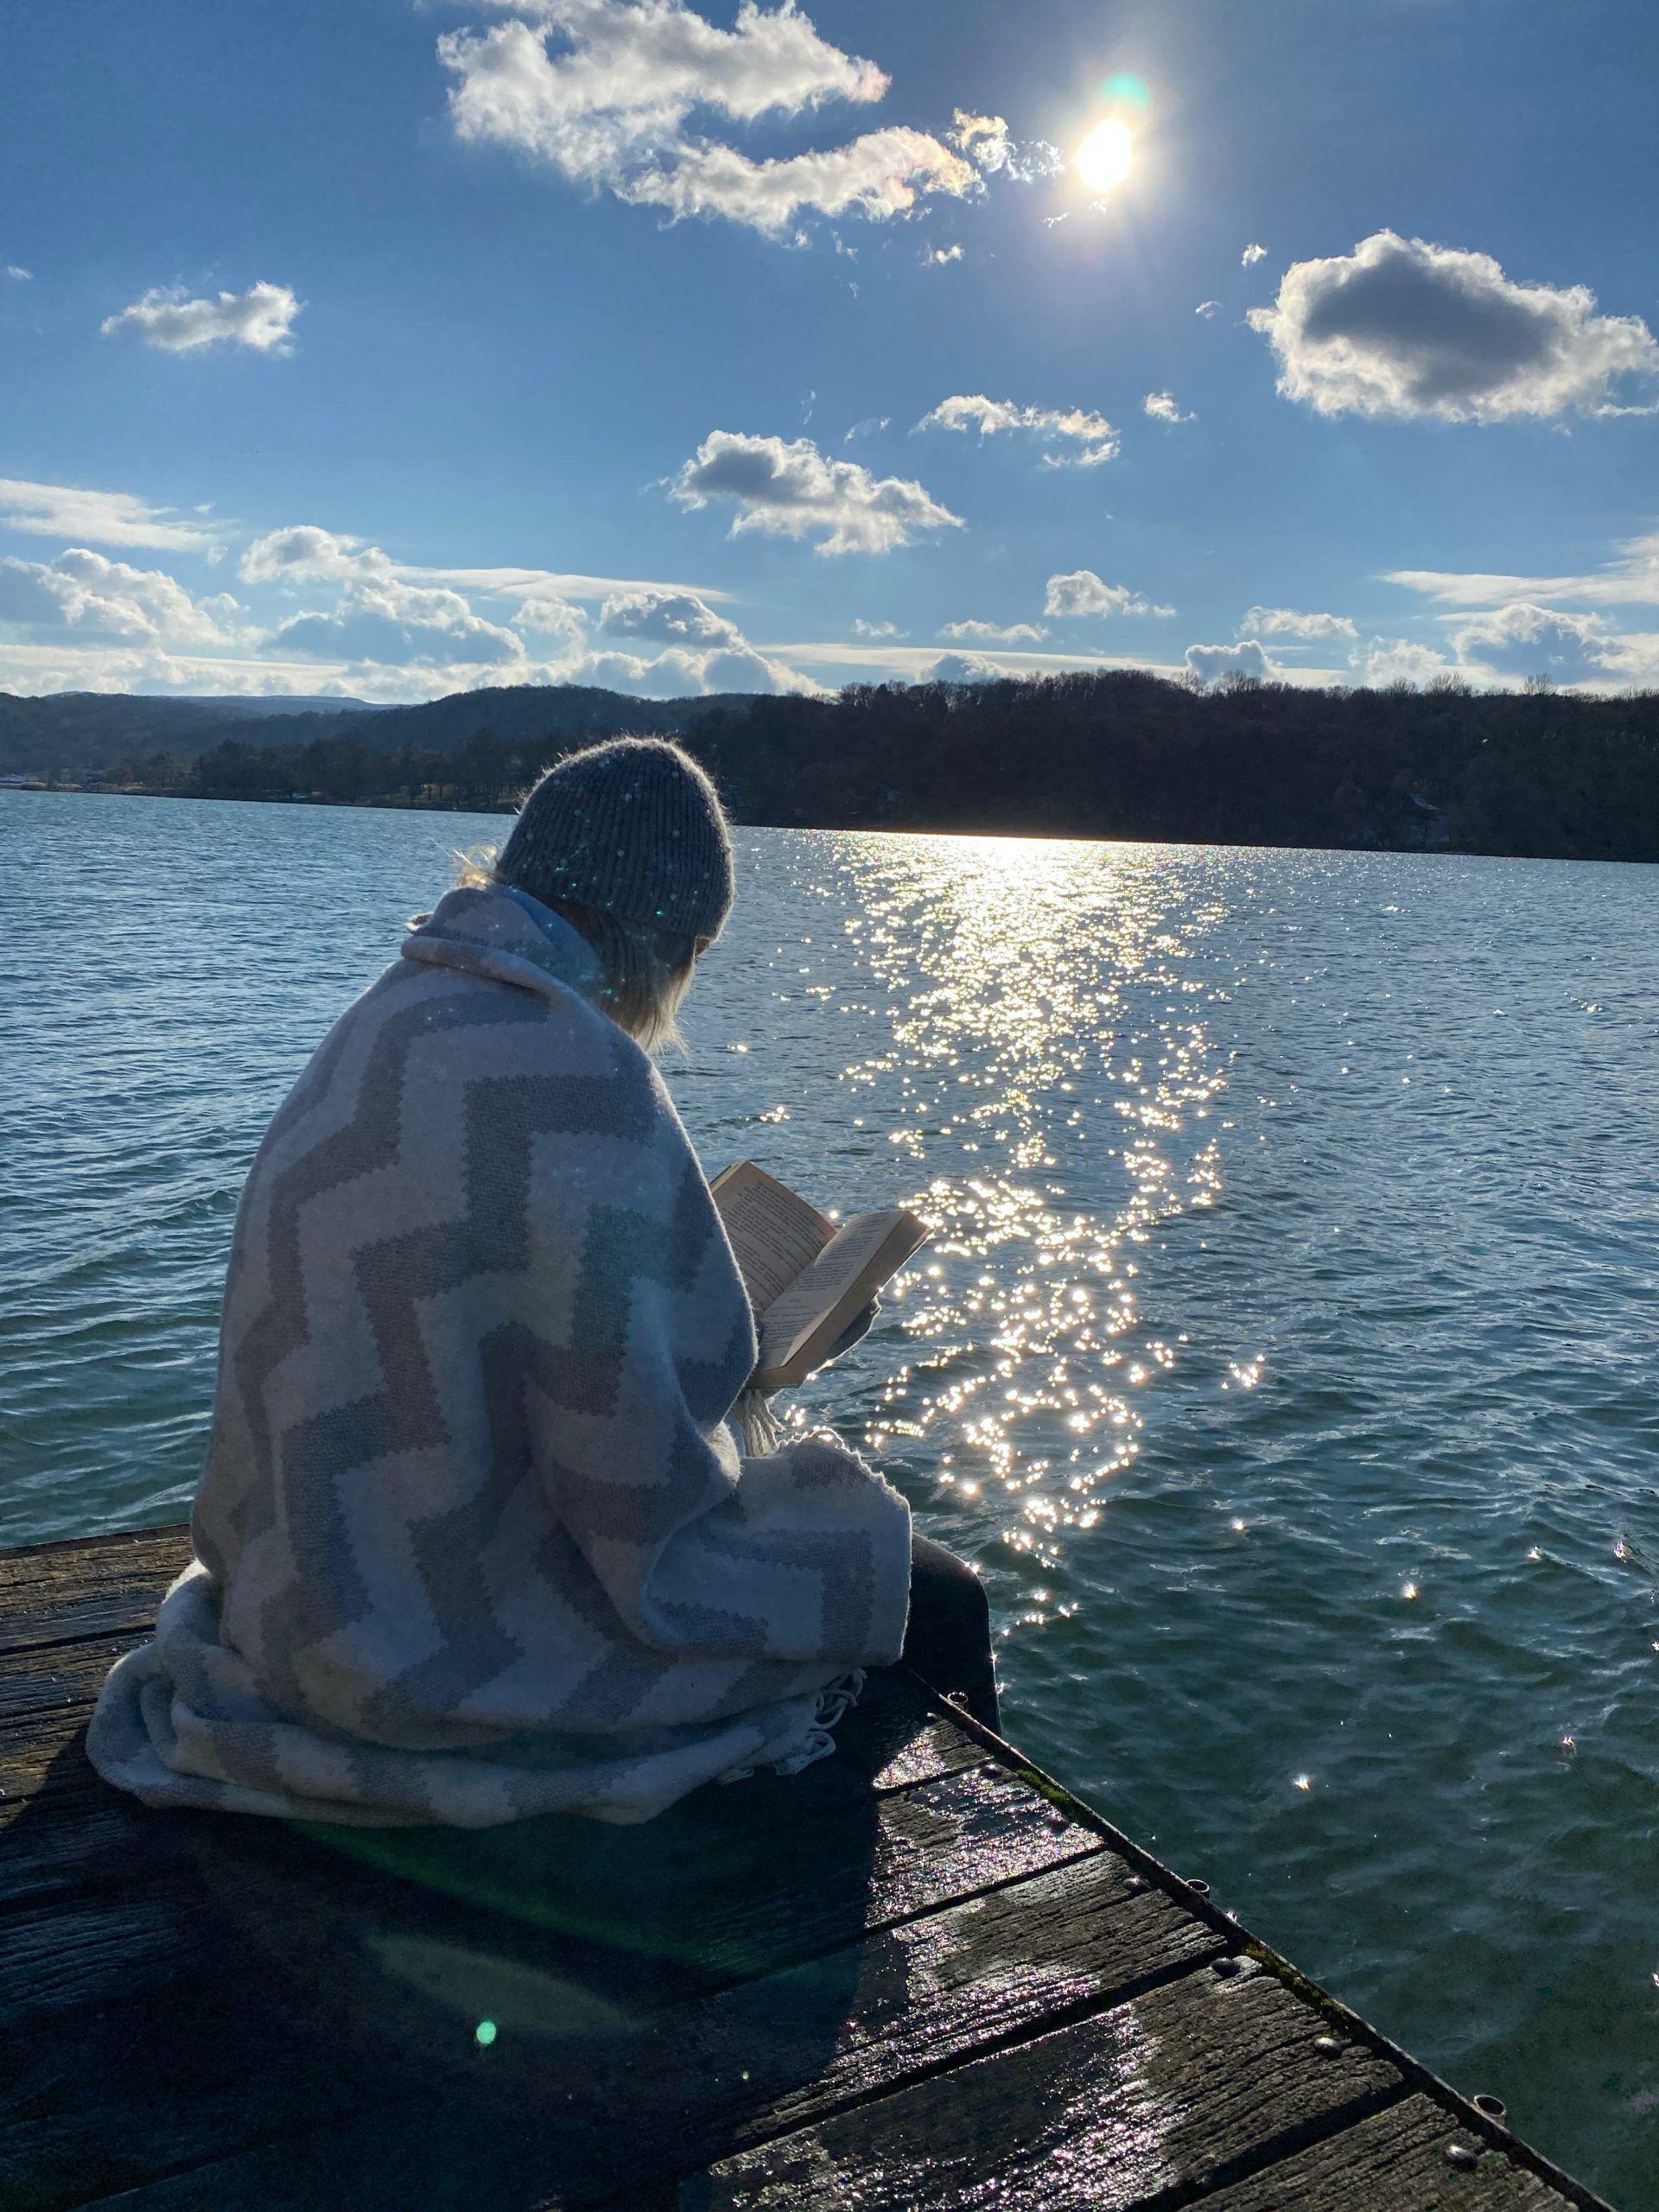 Sara sitting alongside a lake and reading